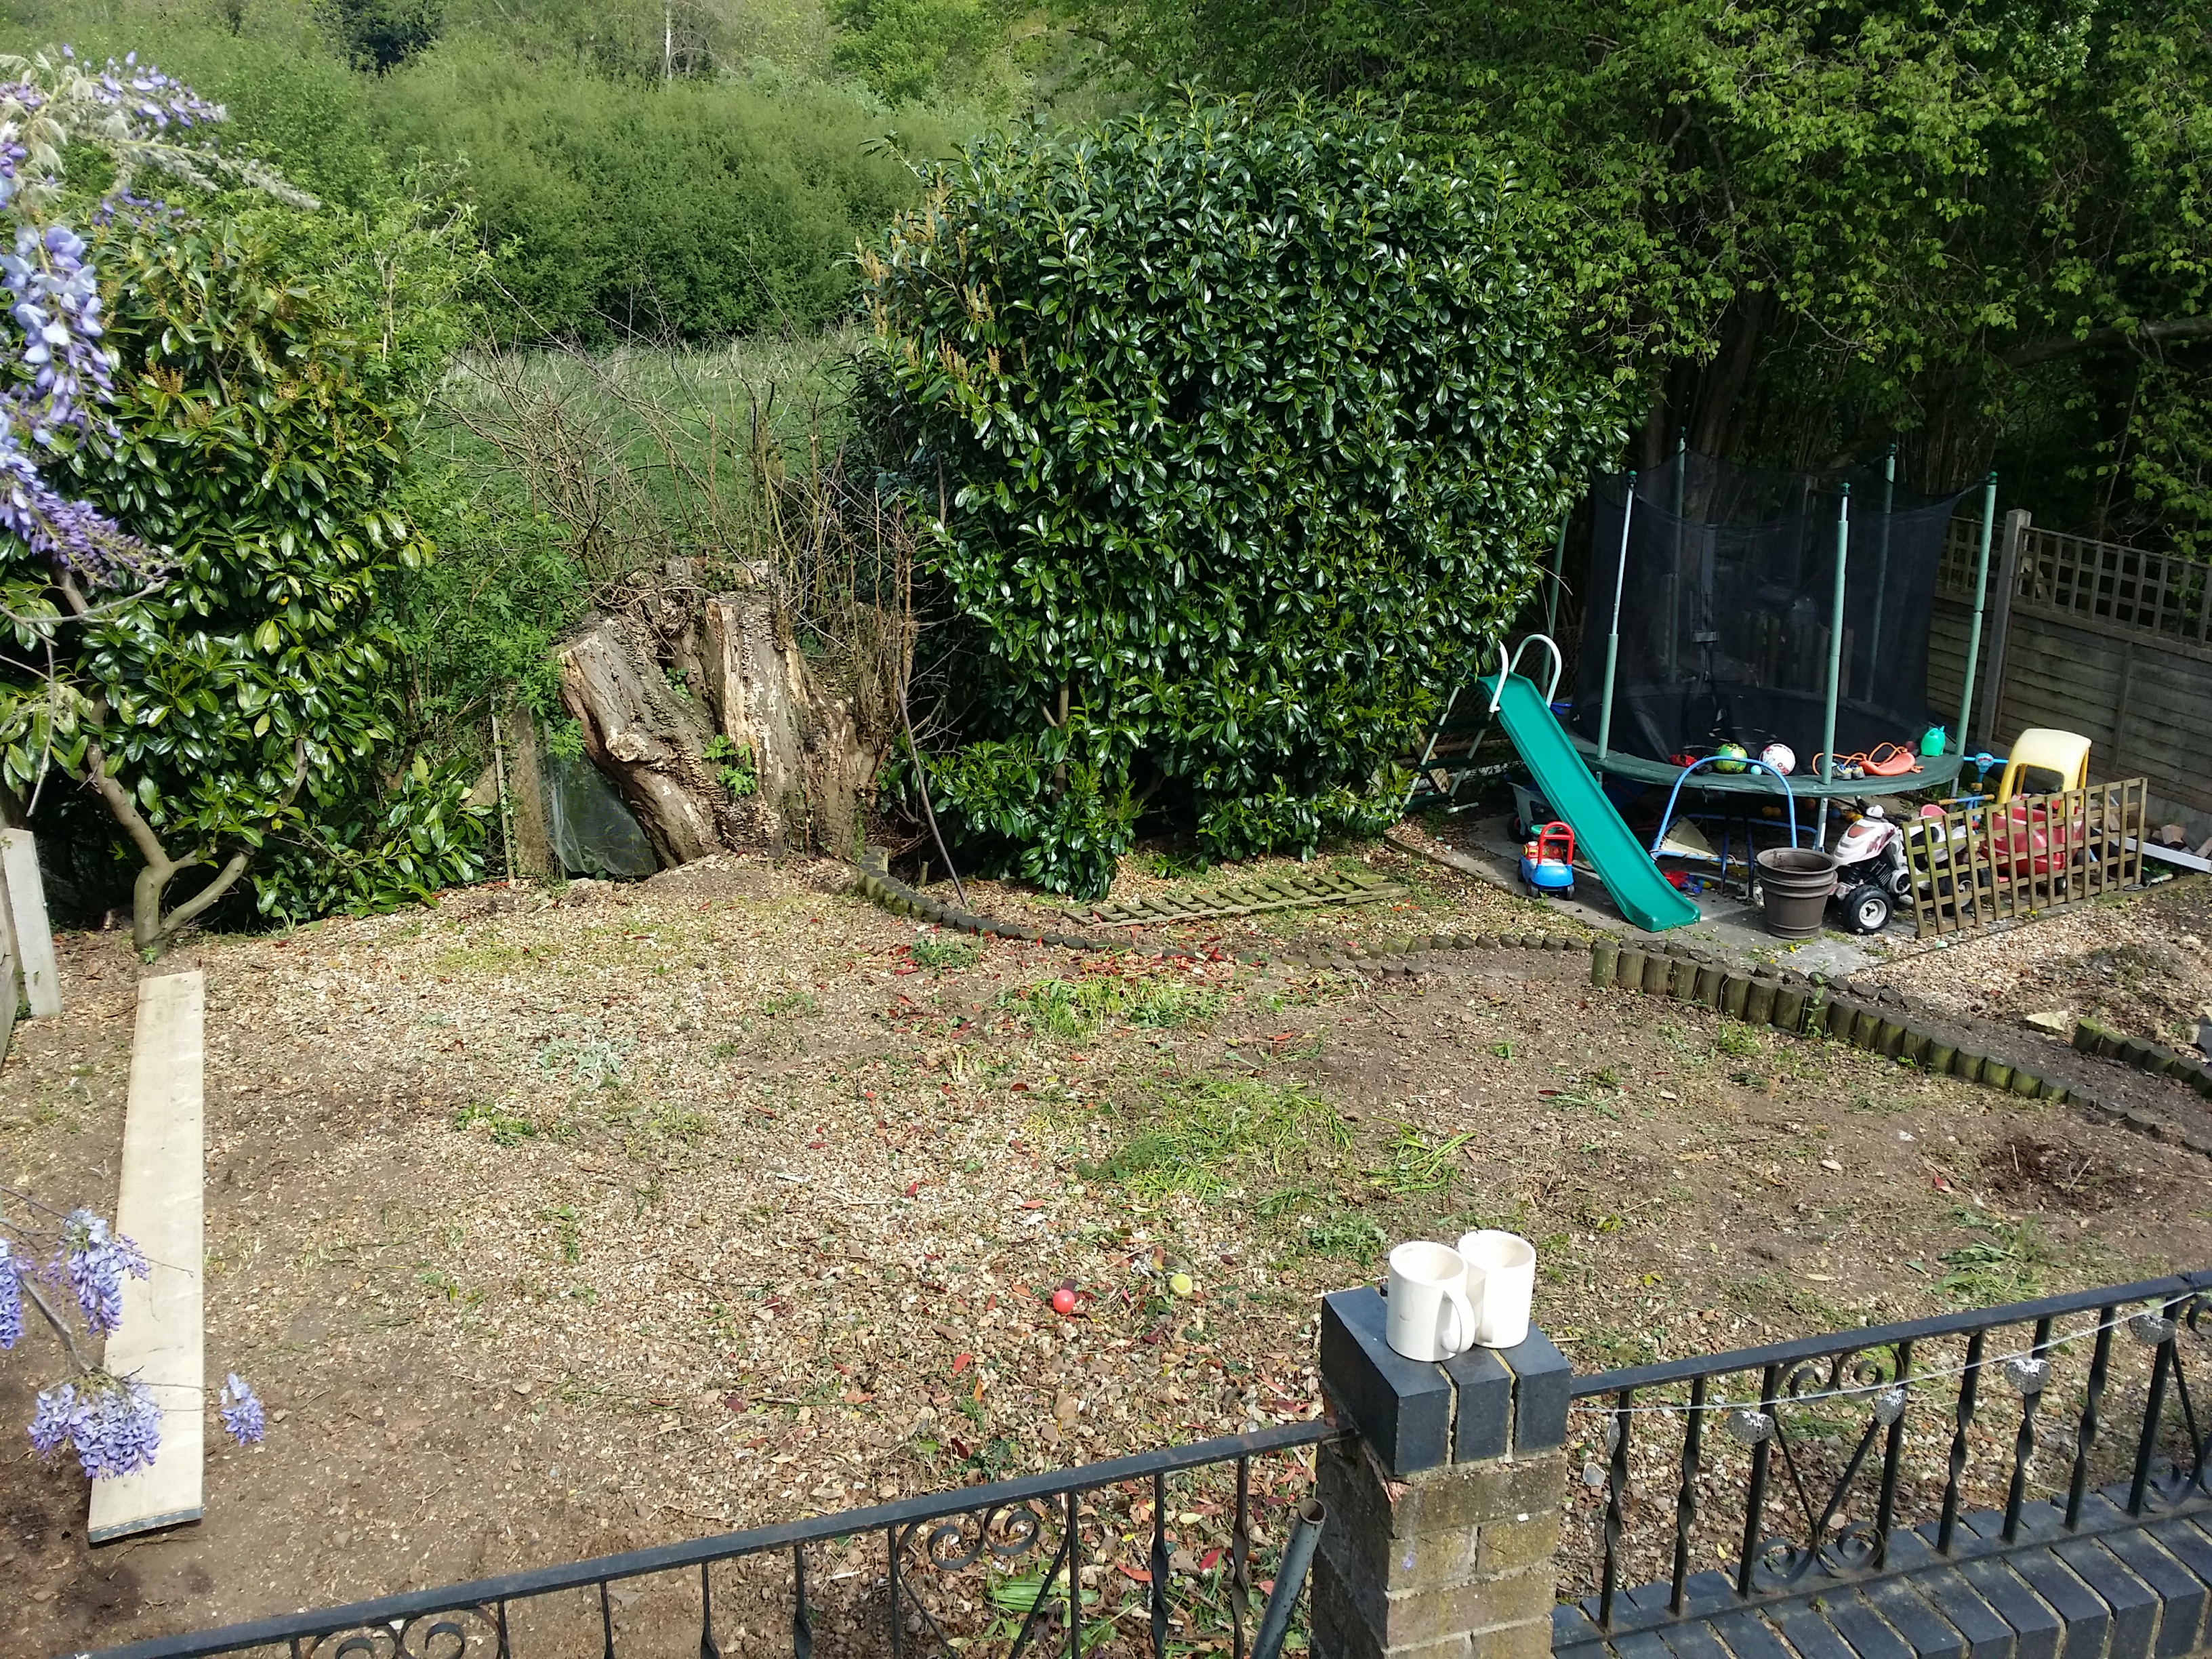 All shrubs removed